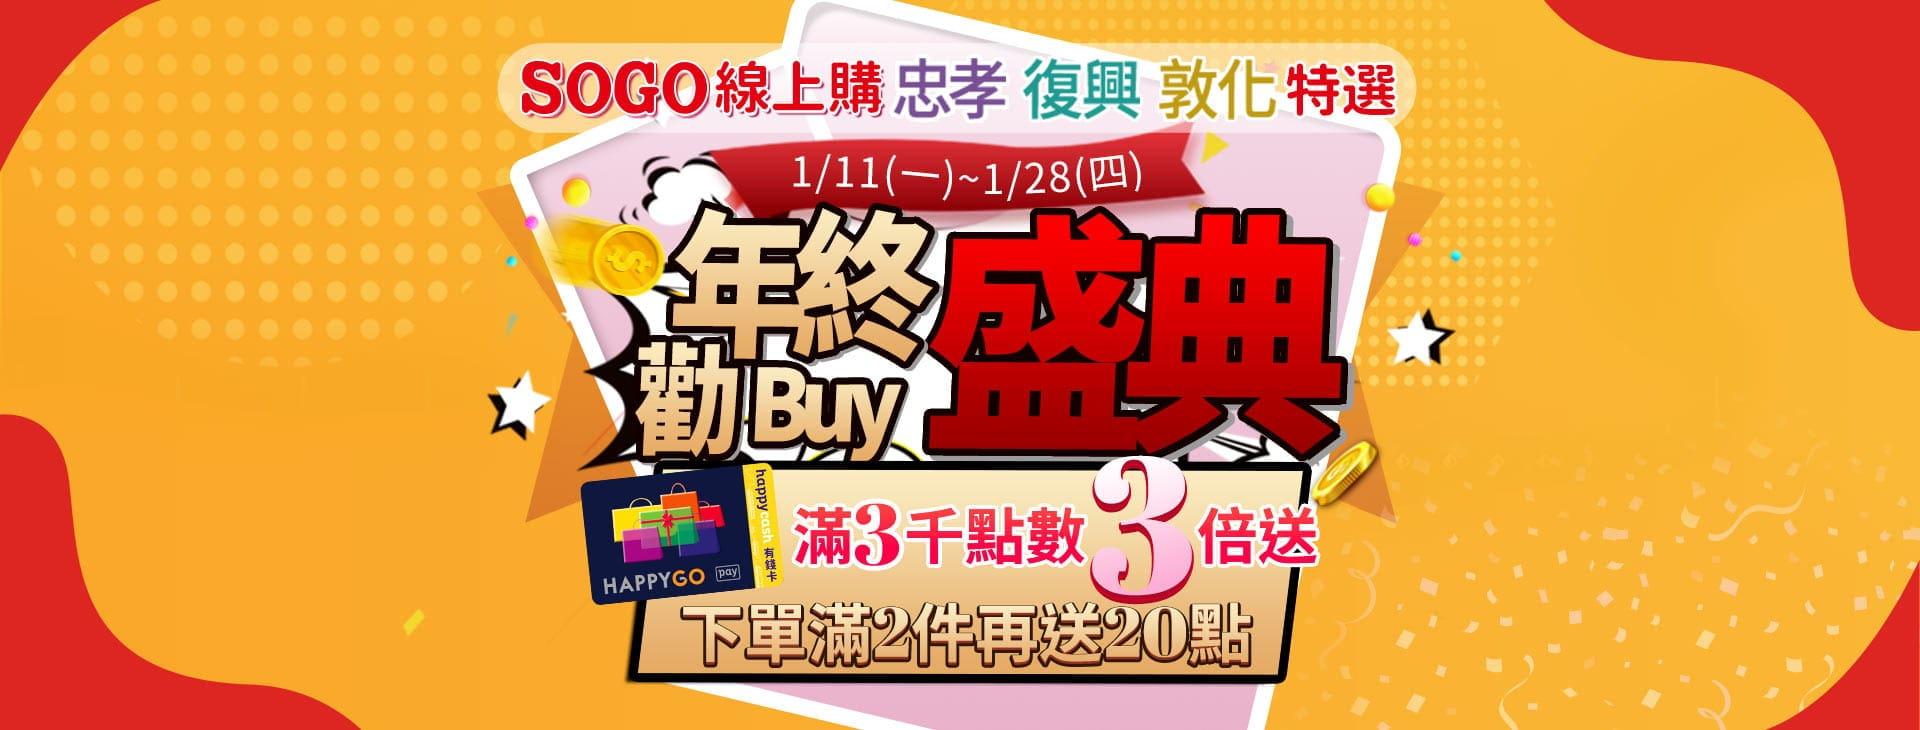 SOGO線上購「年終勸Buy盛典」-2